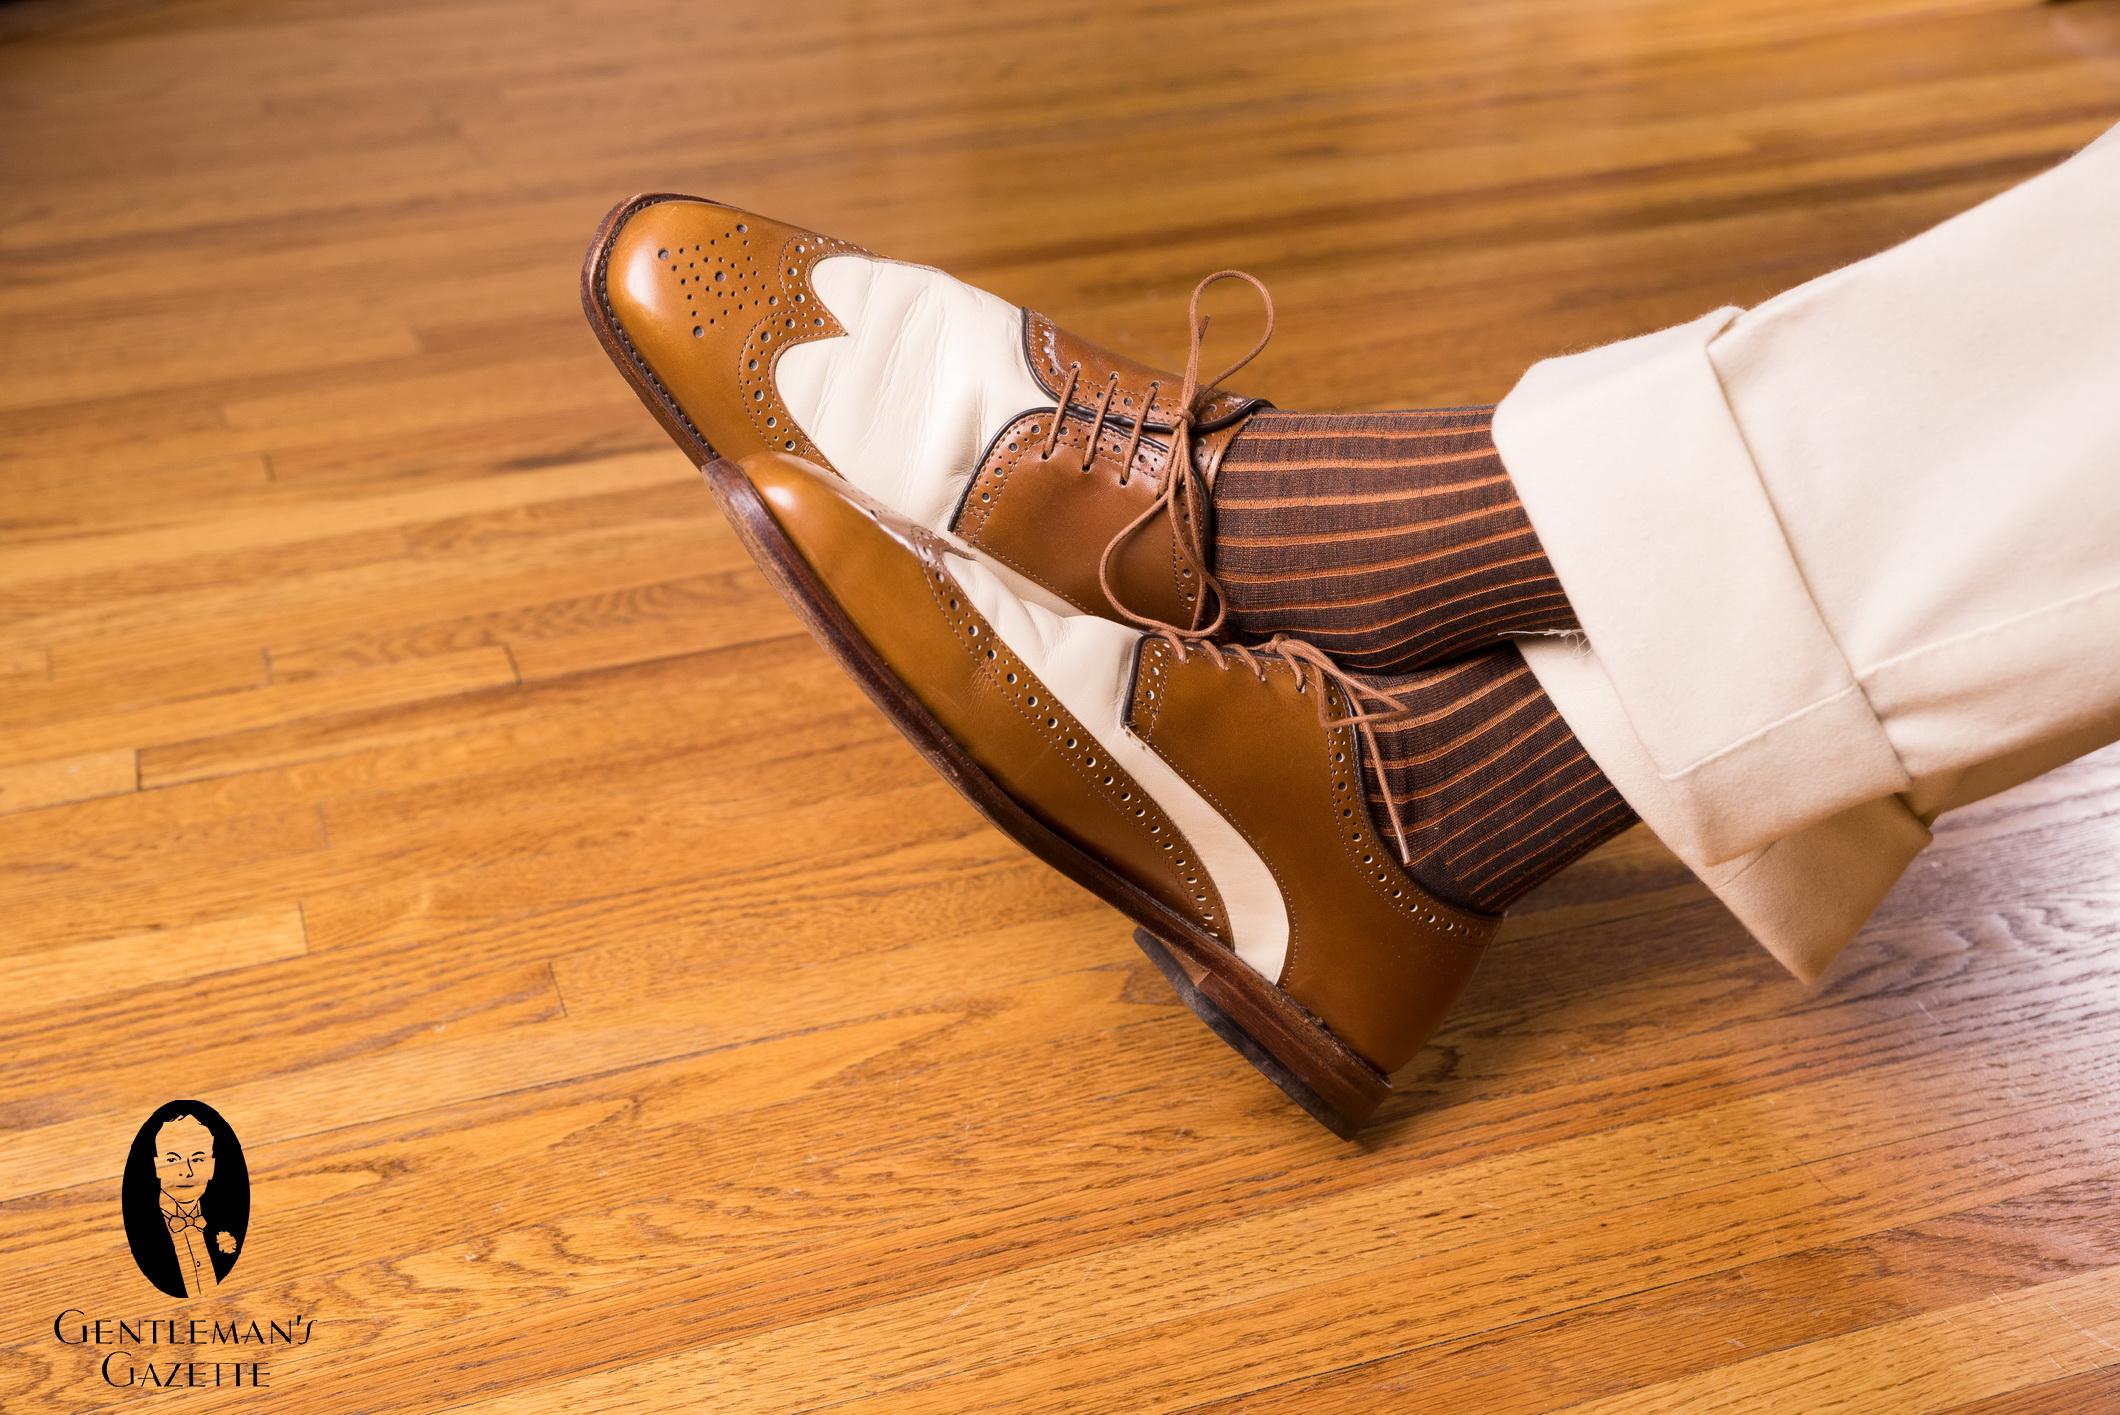 49e2fe81d1c5 Socks-Shoes-Pants-Trousers-Combinations-9549-1.jpg